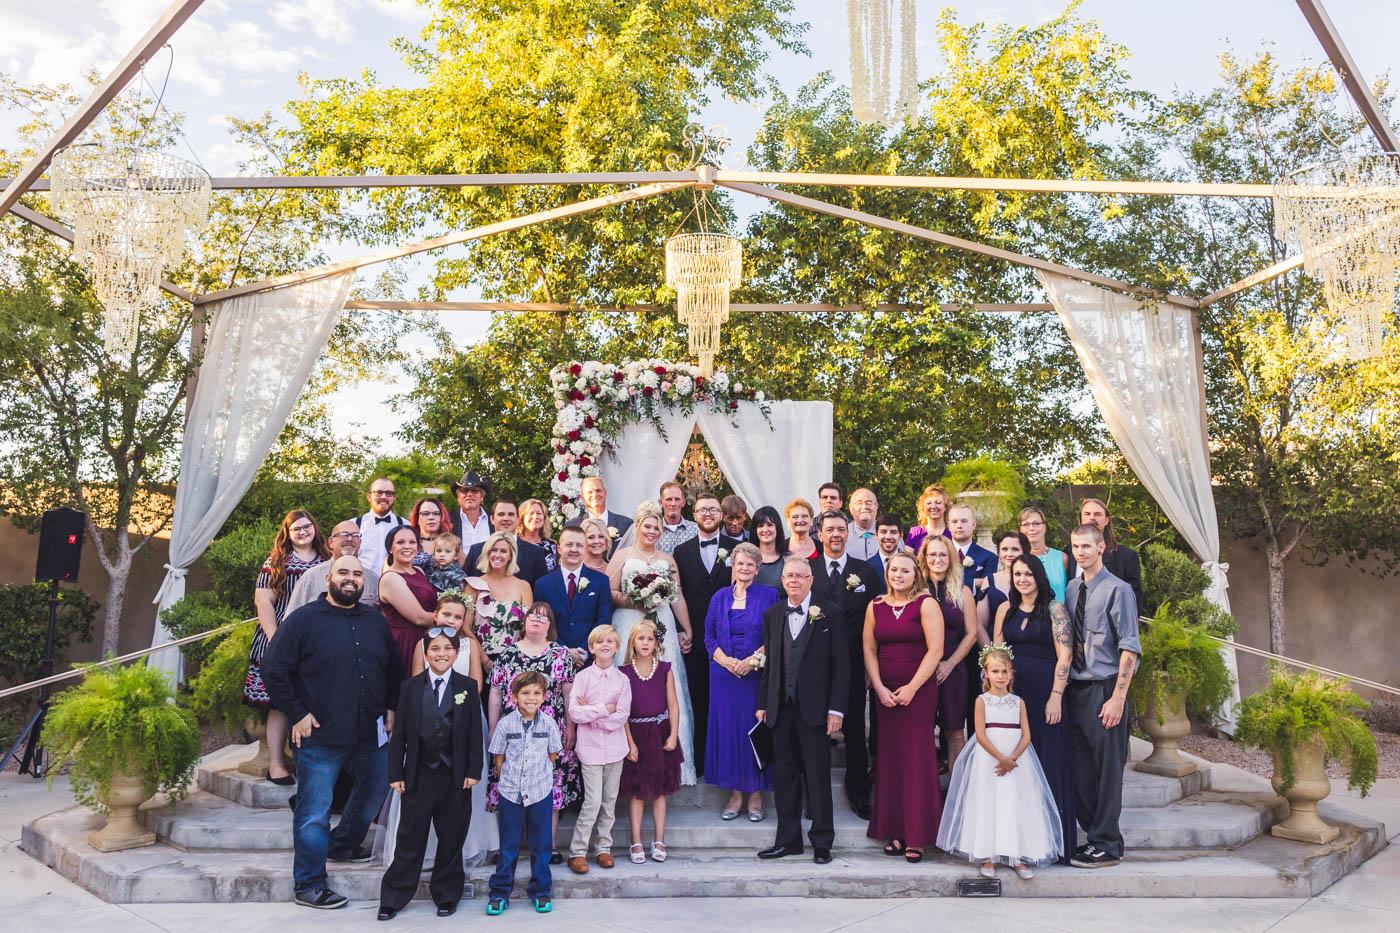 large-family-group-wedding-portrait